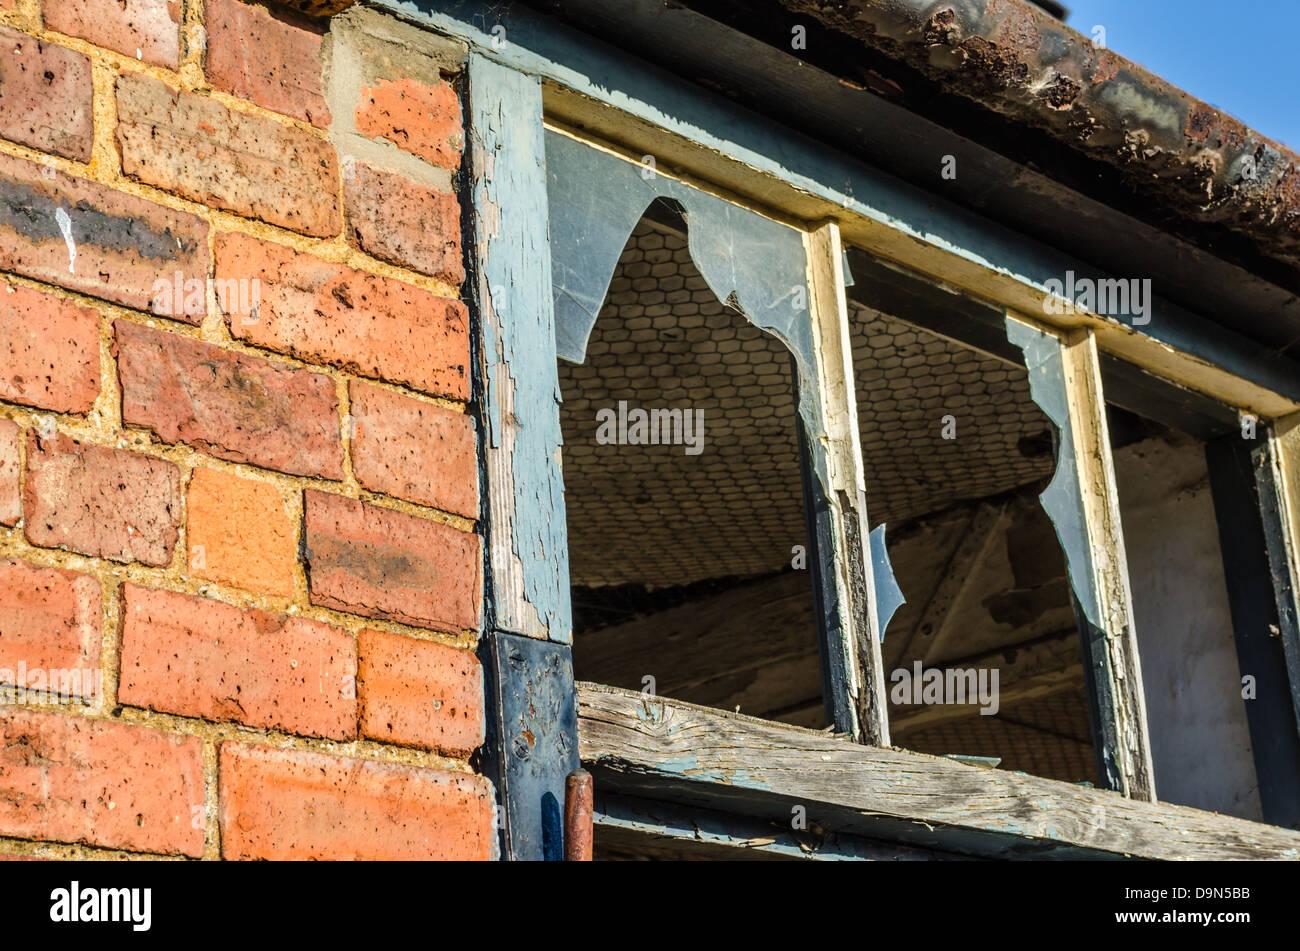 Old brick building. Moreton-in-Marsh, Gloucestershire, England. - Stock Image